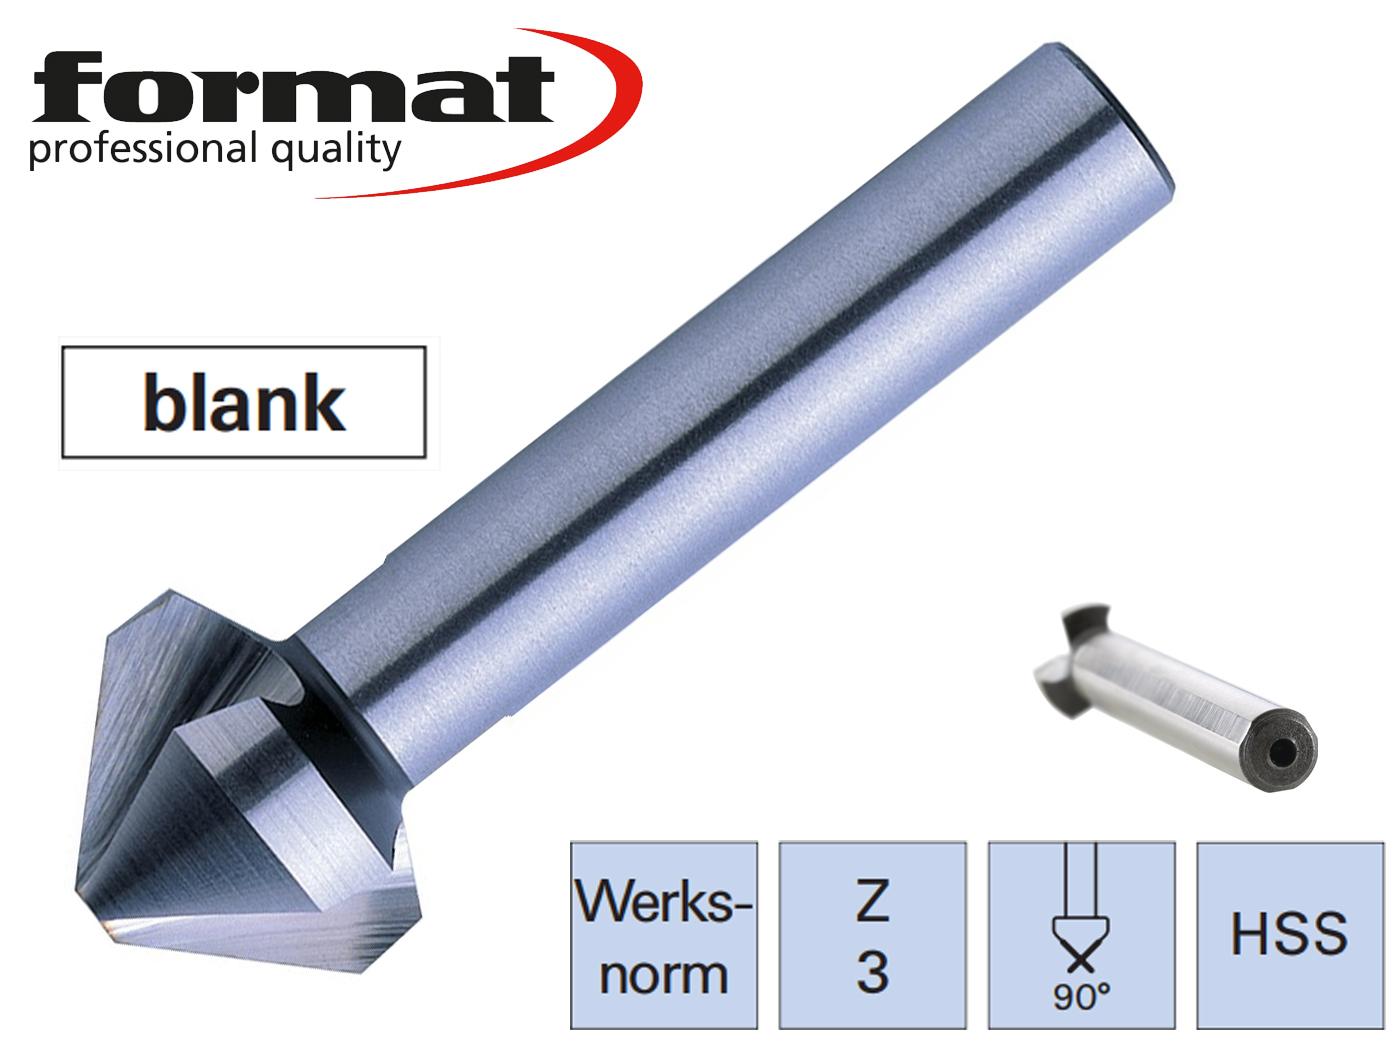 verzinkboor DIN 335C HSS ADVANCED Exact | DKMTools - DKM Tools